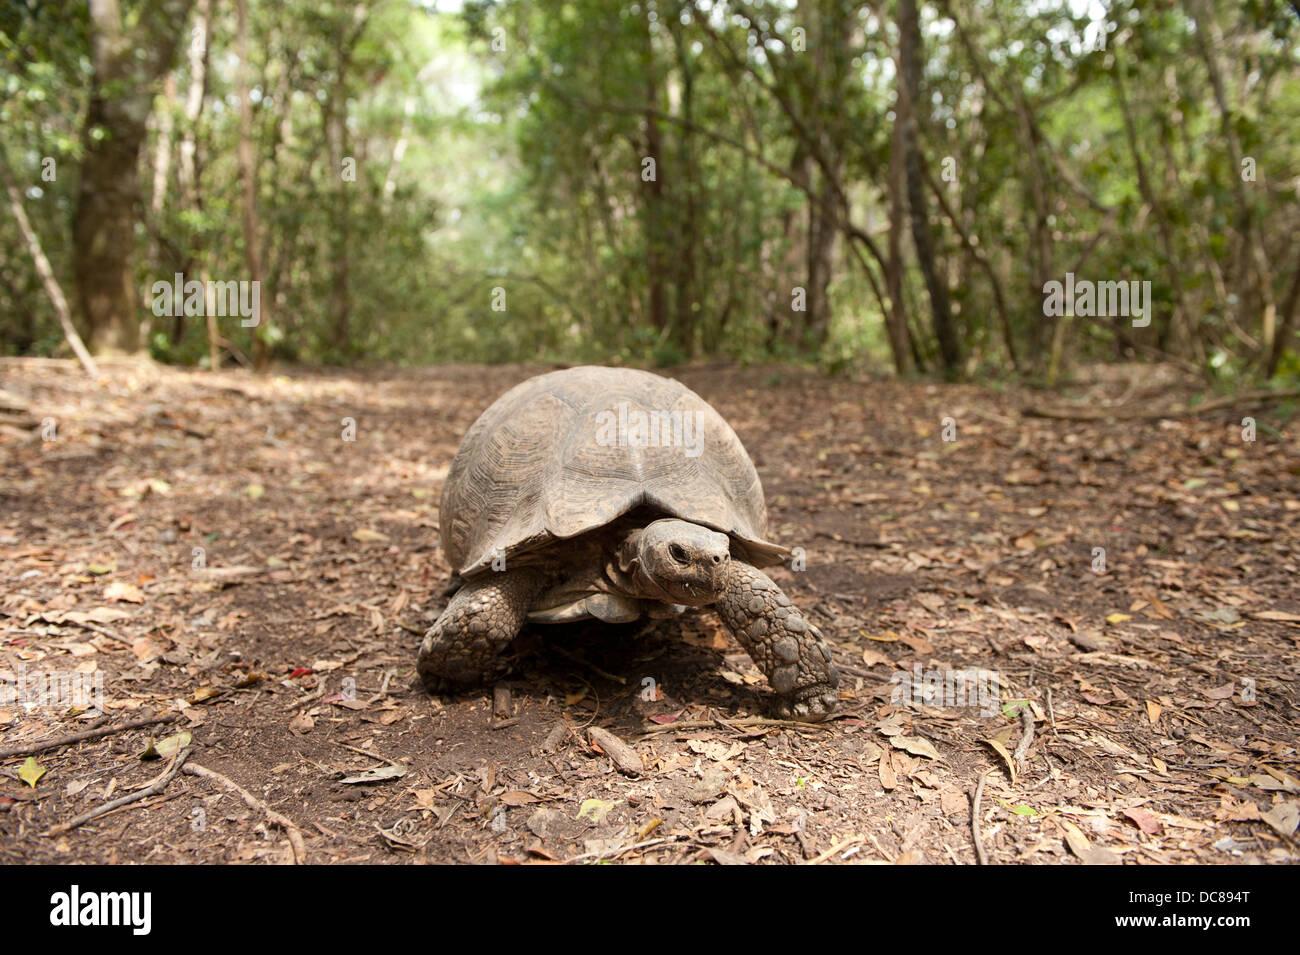 Leopard tortoise (Geochelone pardalis), Plettenberg Bay, South Africa - Stock Image